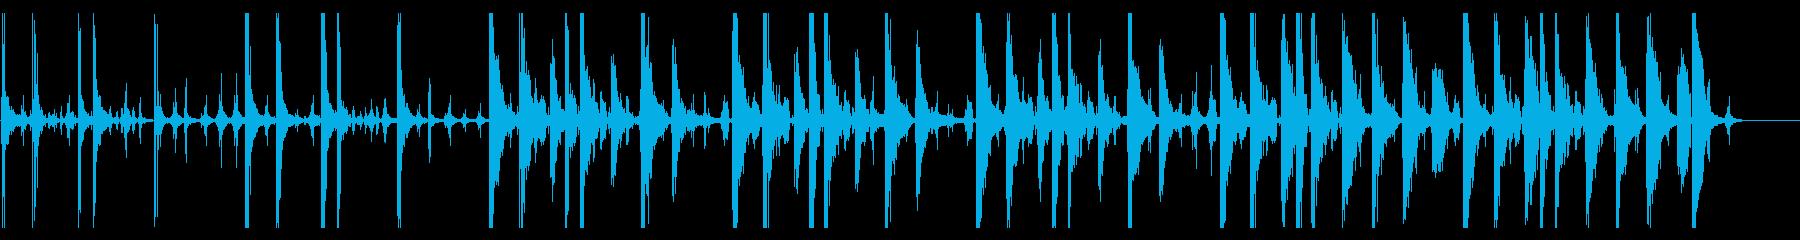 KANTハンズクラップシジングル2の再生済みの波形